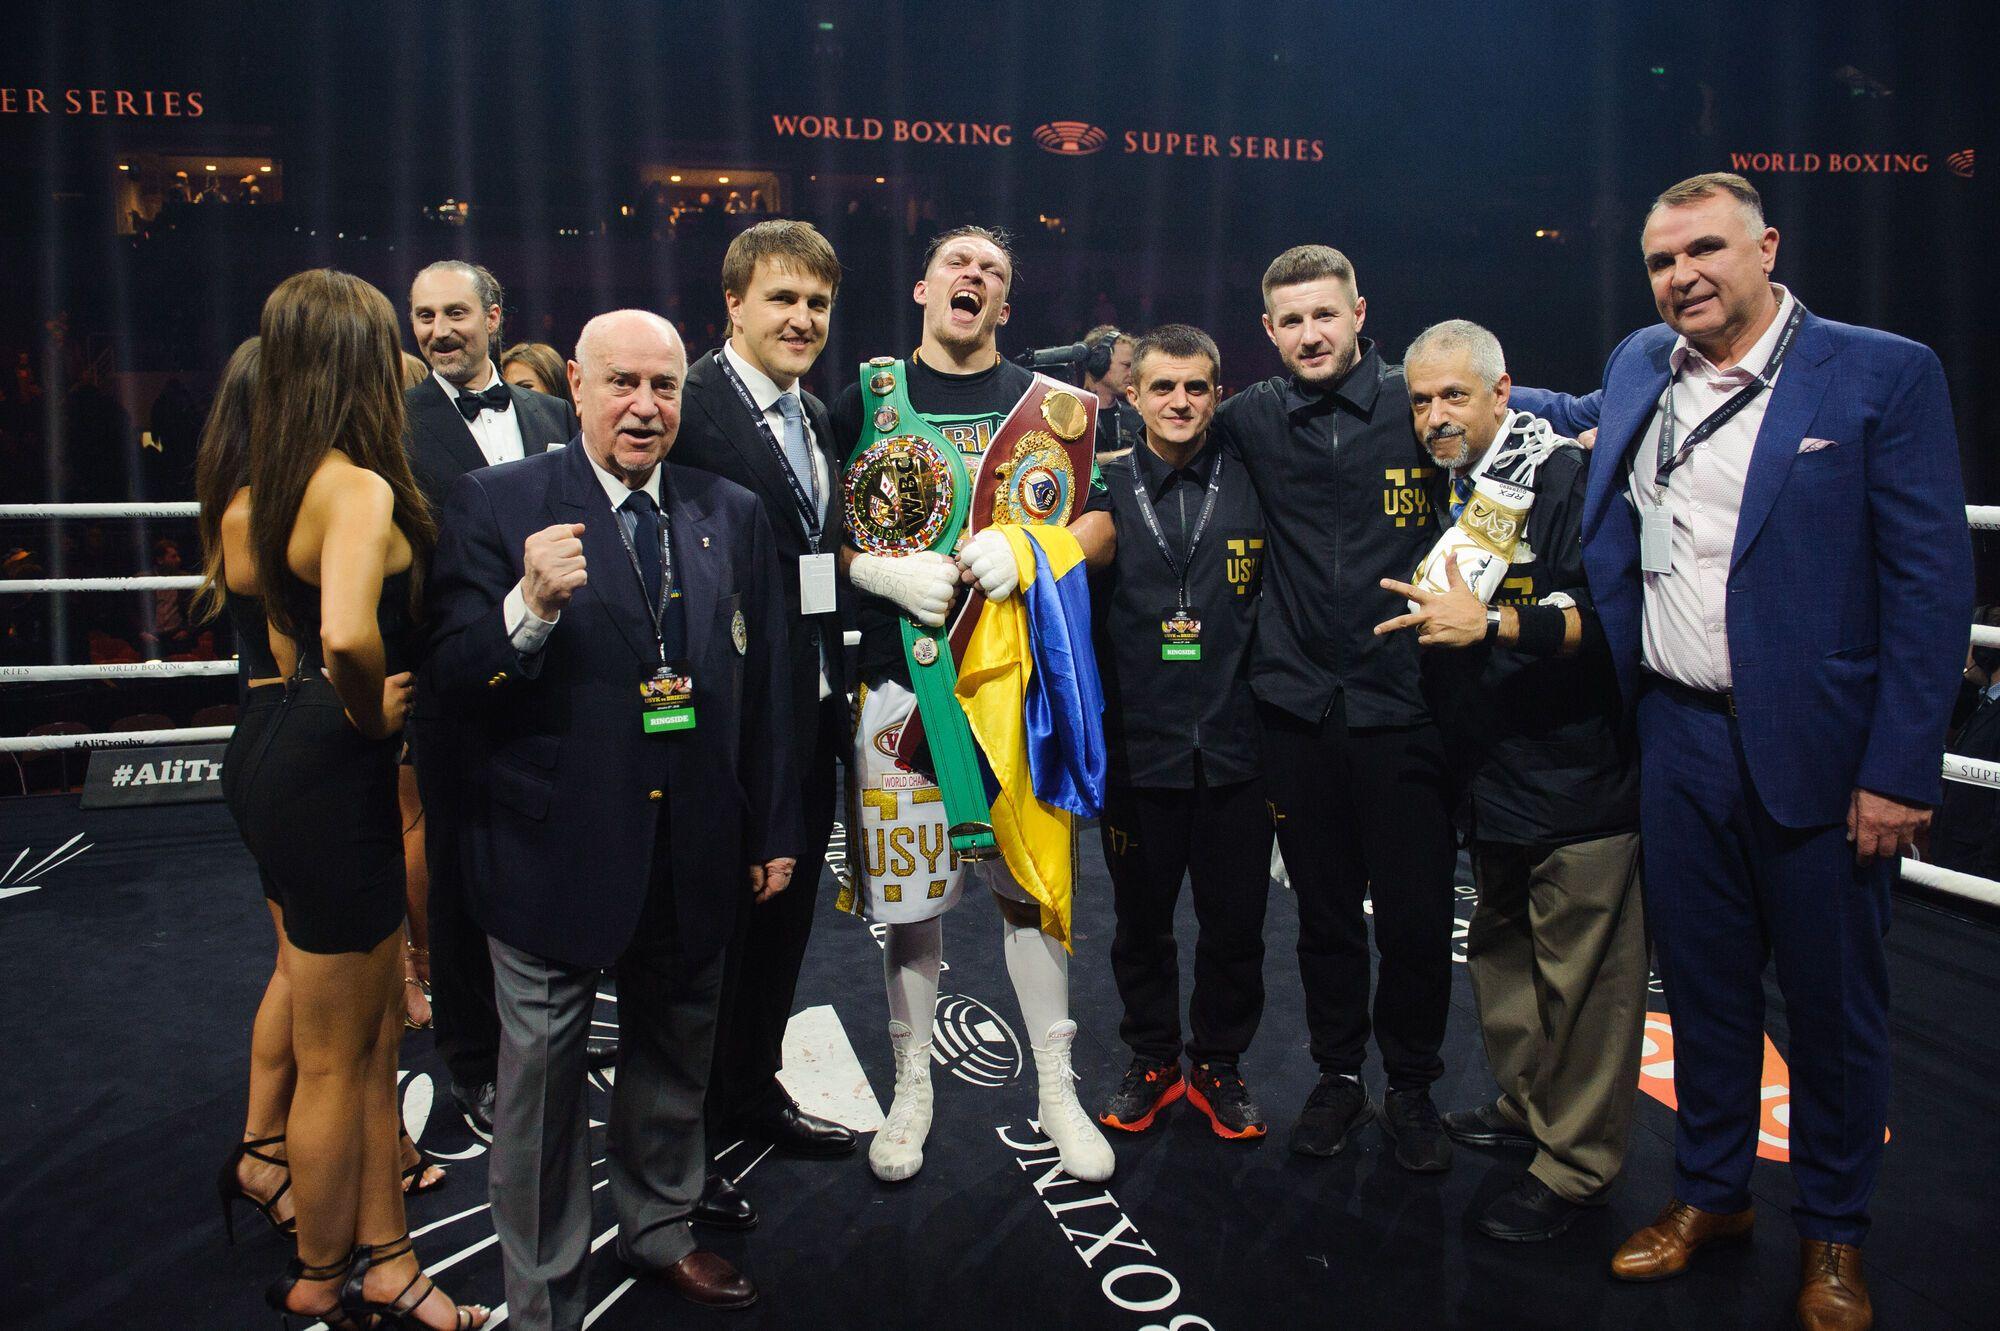 Усик победил Бриедиса и вышел в финал WBSS